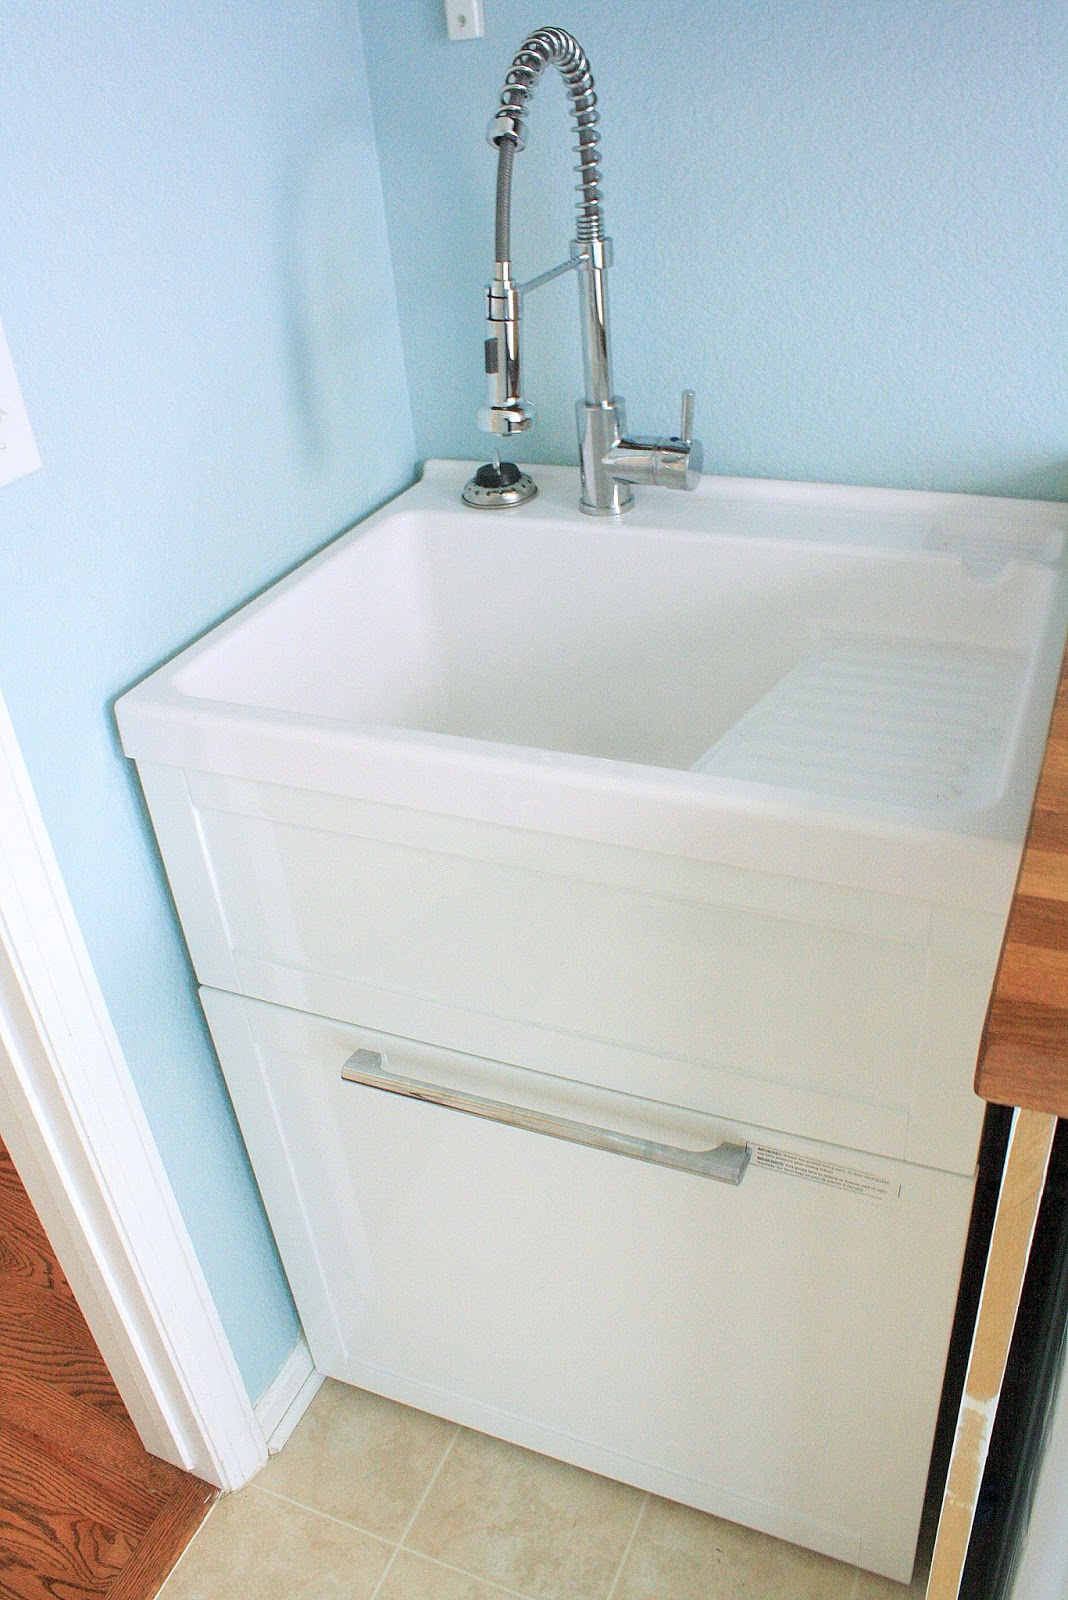 Kitchen Designs With Corner Sinks Laundry Room Utility Sinks Interior Design Ideas